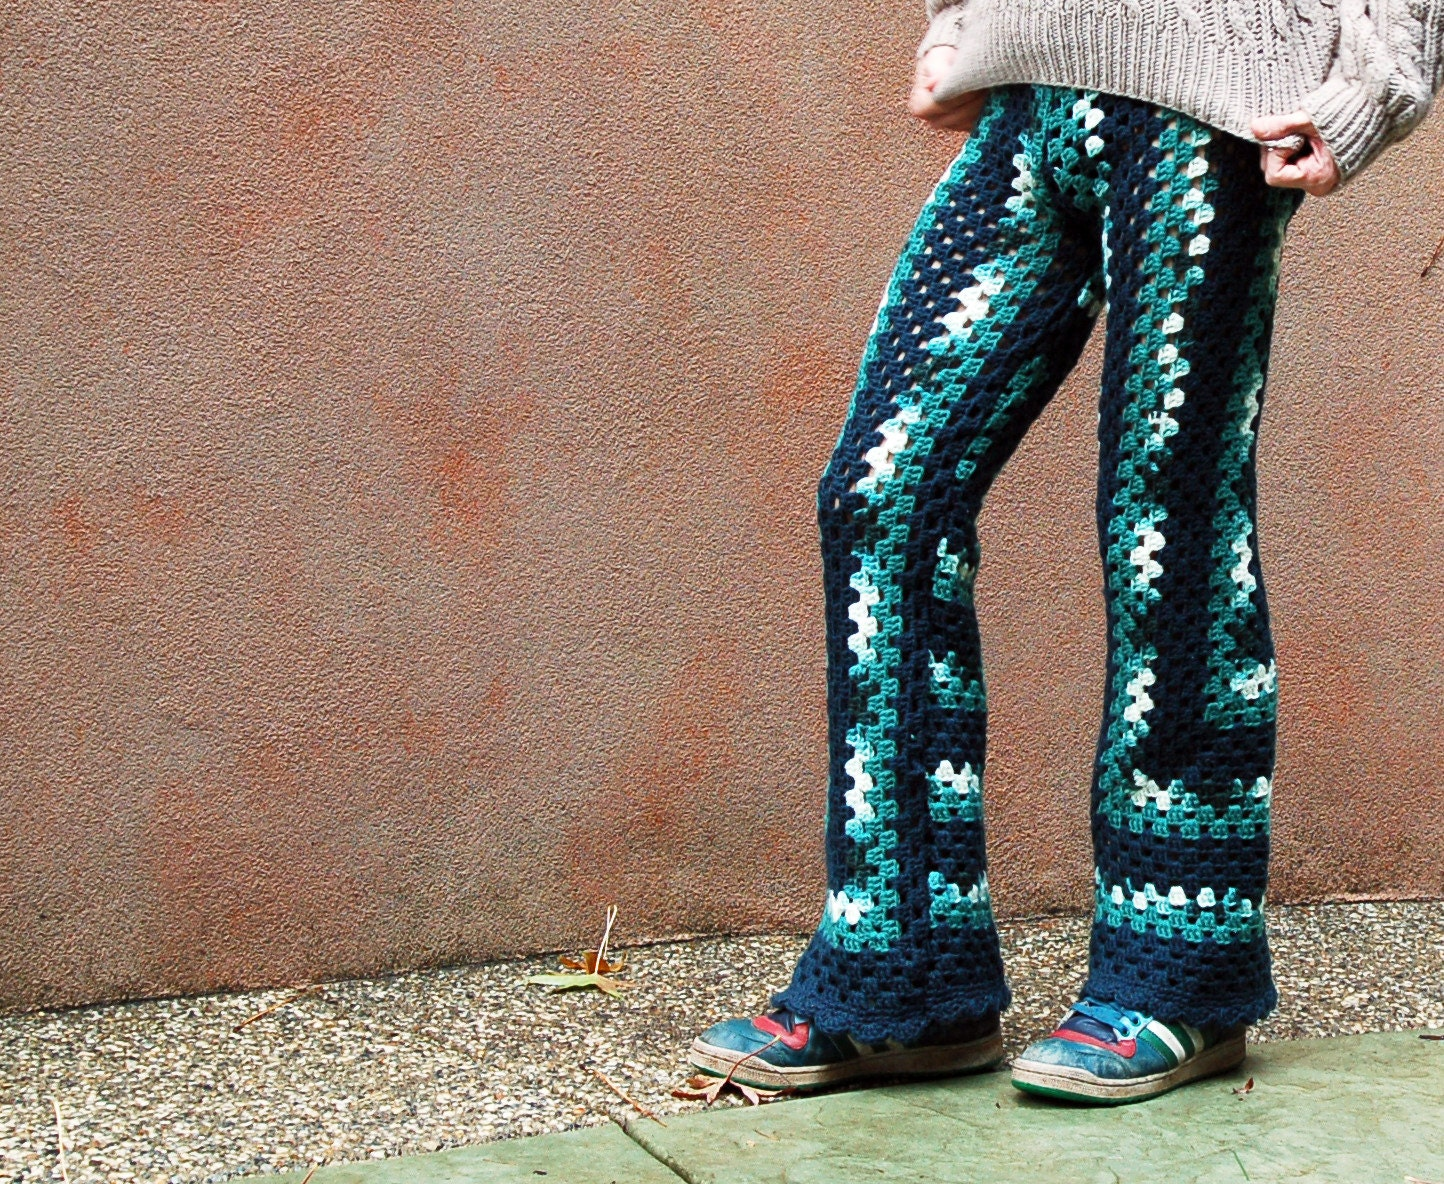 Crochet Pattern Yoga Pants : Forest Green Crochet Pants by LordvonSchmitt on Etsy